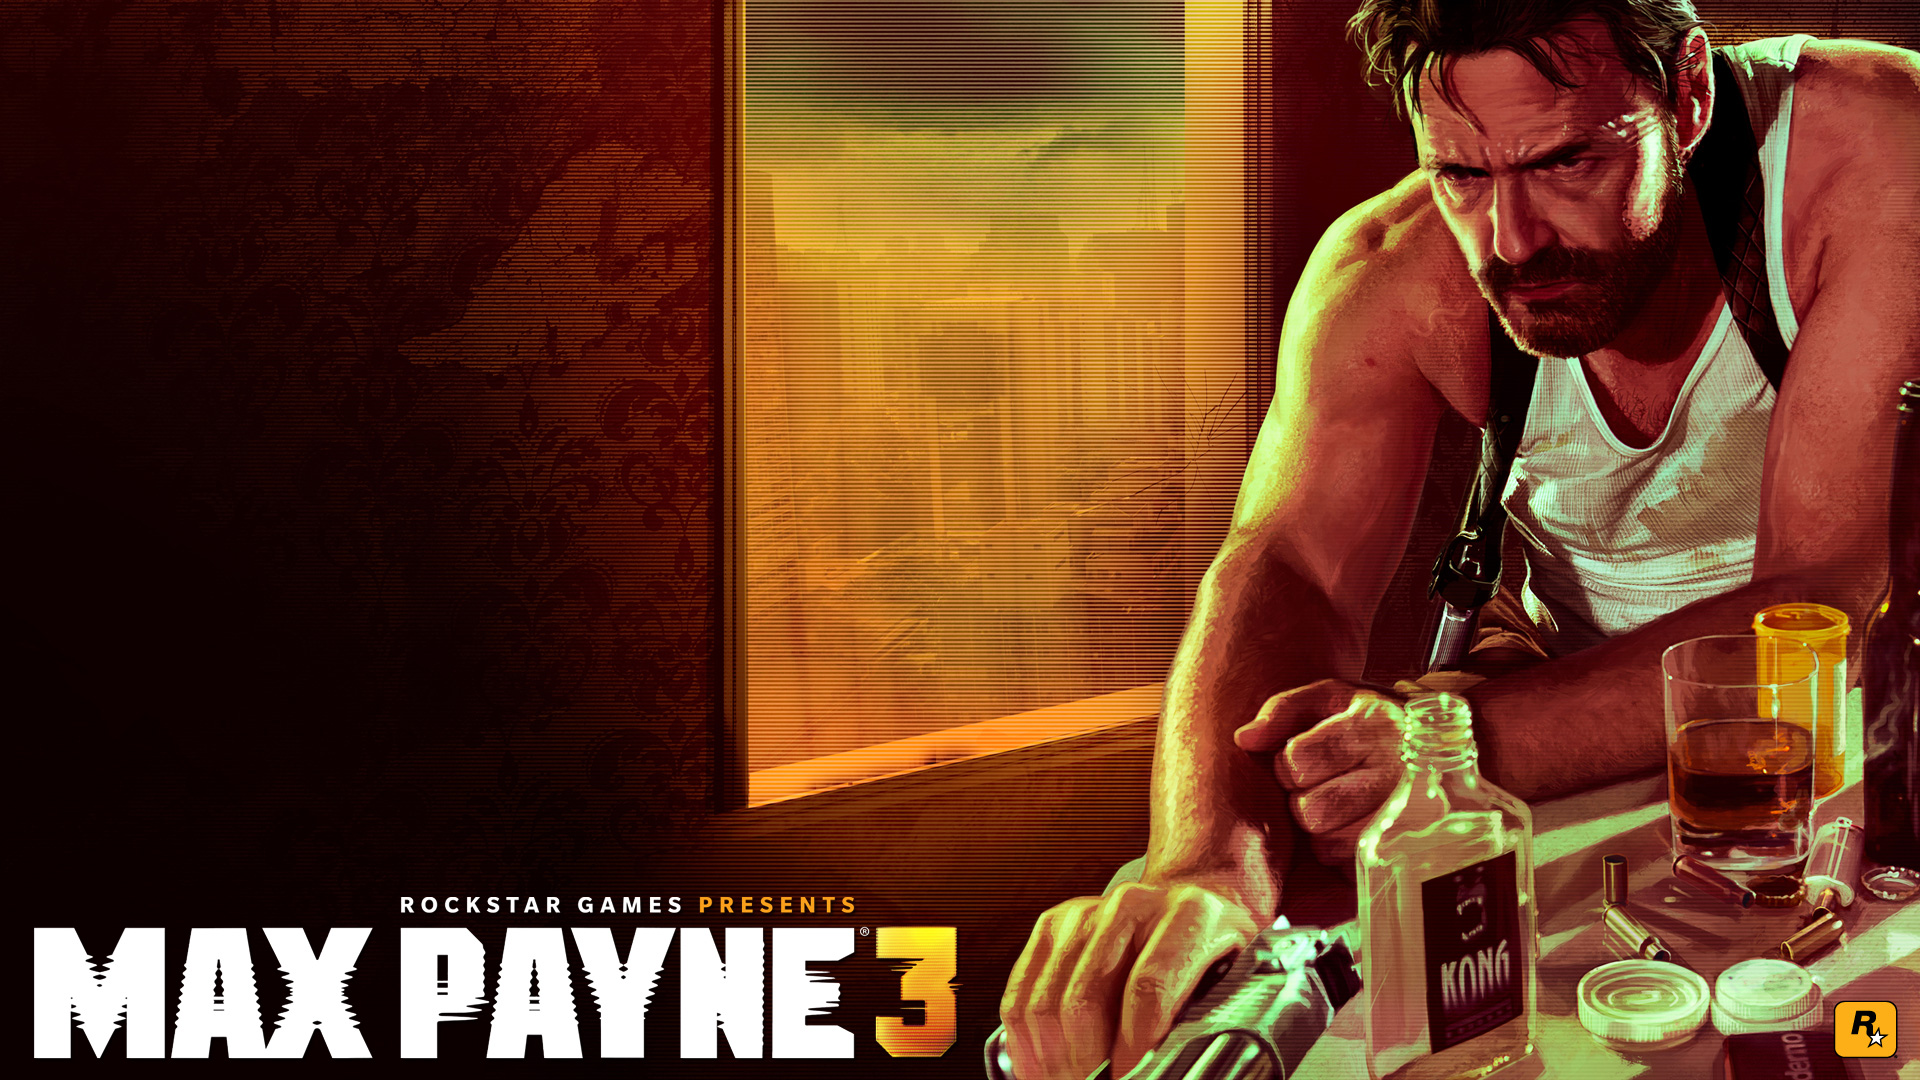 Max Payne 3 Wallpaper in 1920x1080